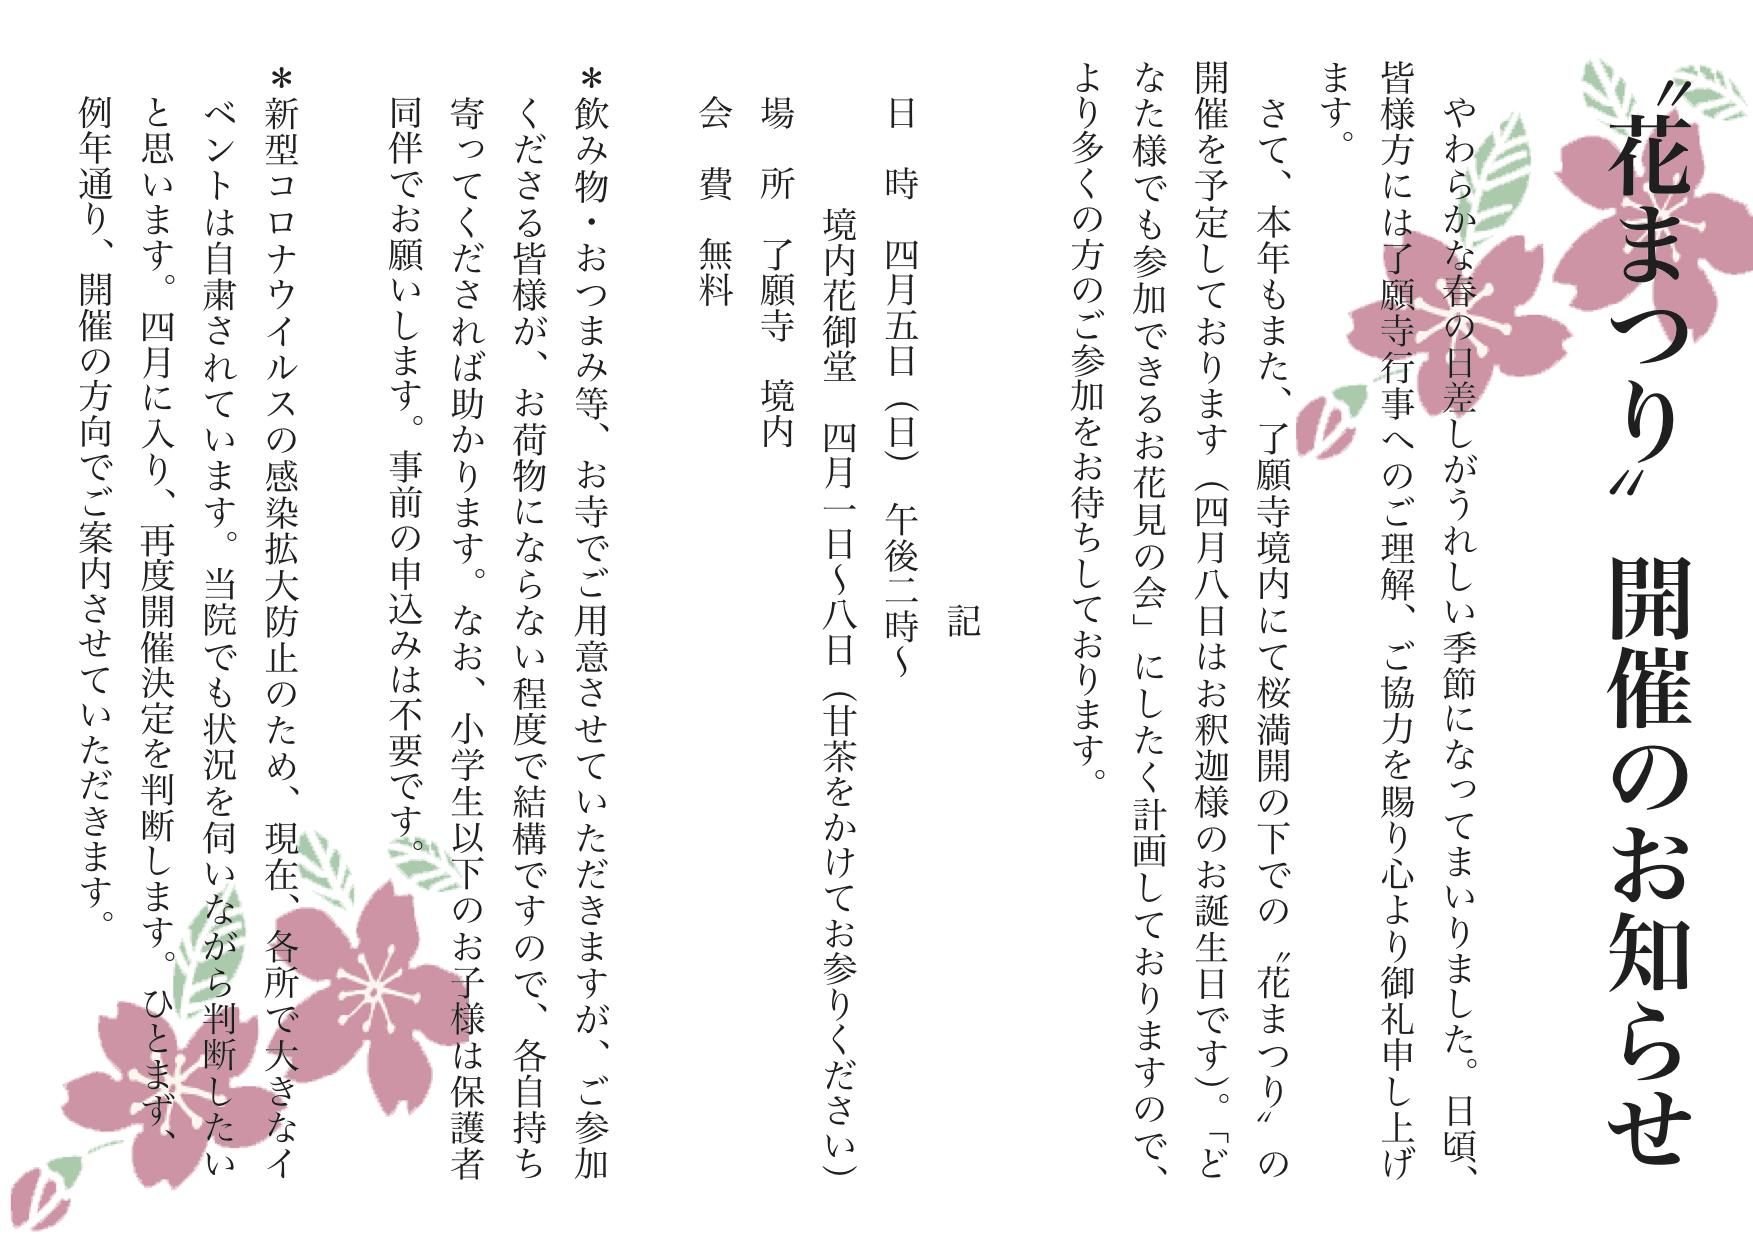 hanamatsuri_annai.png